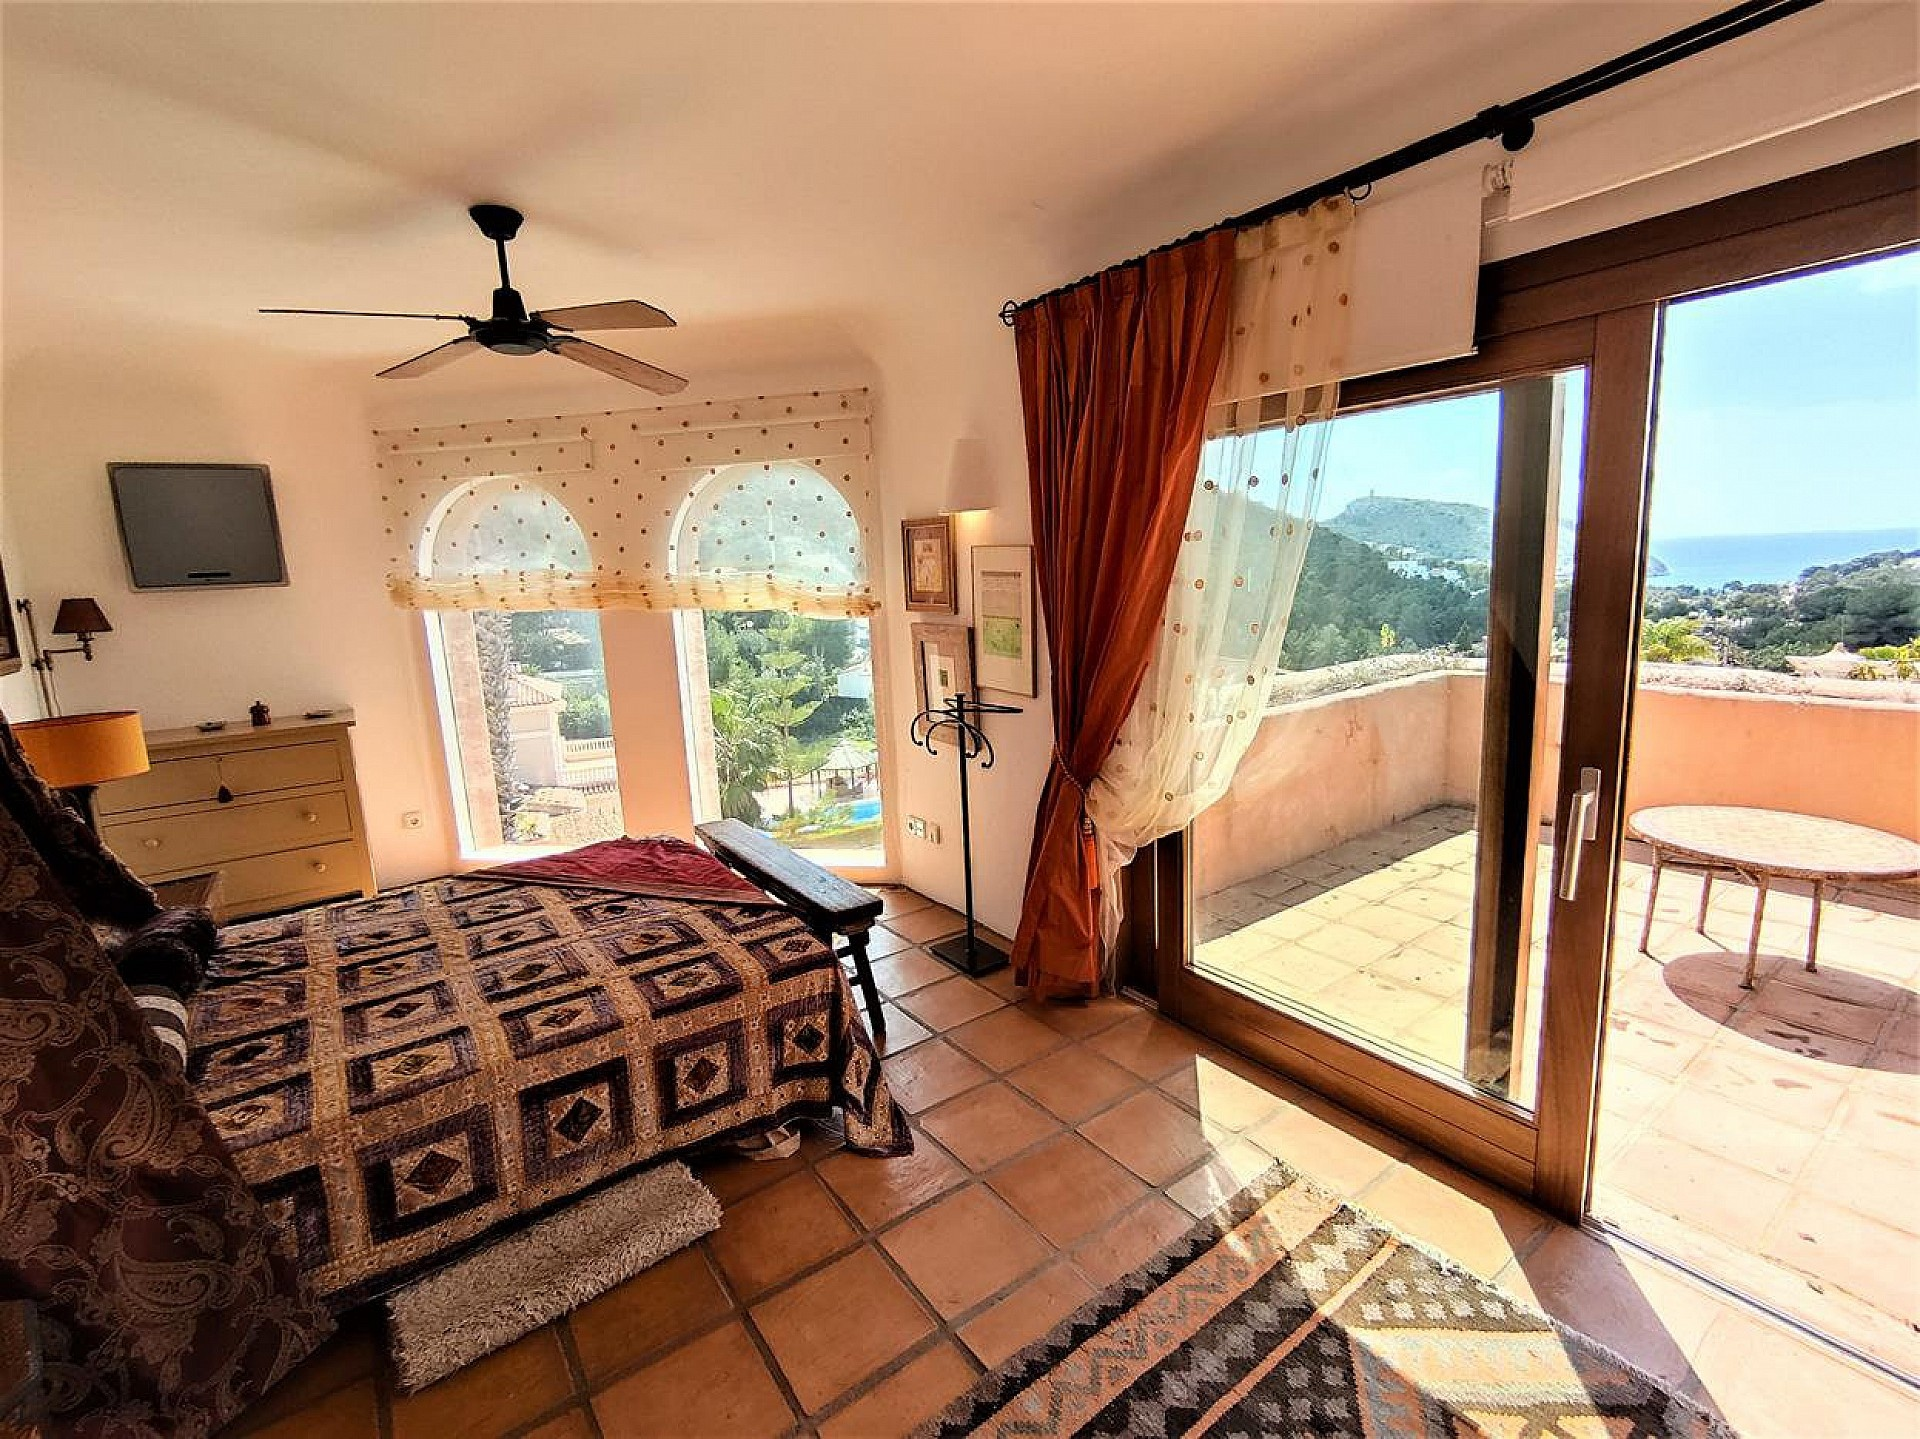 w_luxe-huis-moraira-costa-blanca-spanje-27.jpg